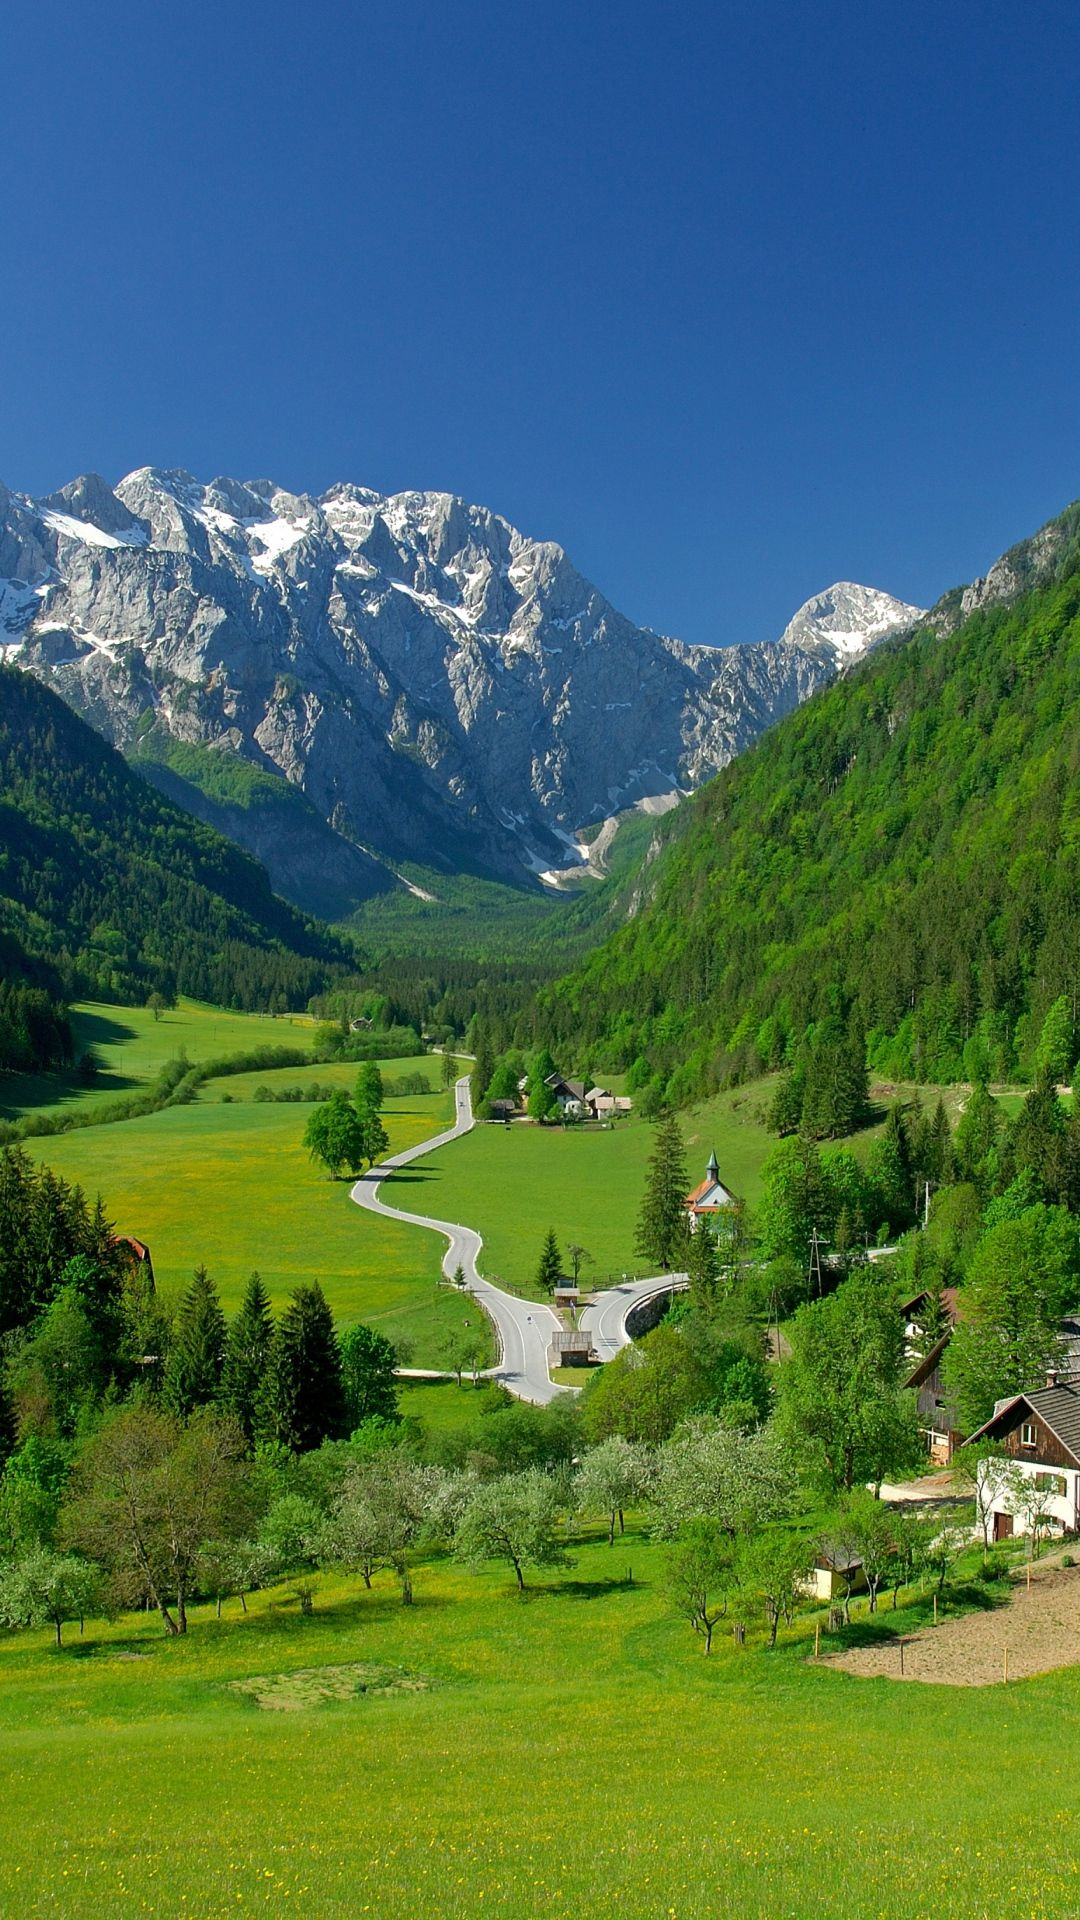 Spring Alpine Valley Mountains Fields Landscape Paisajes Hermosos Paisajes Paisaje De Montana